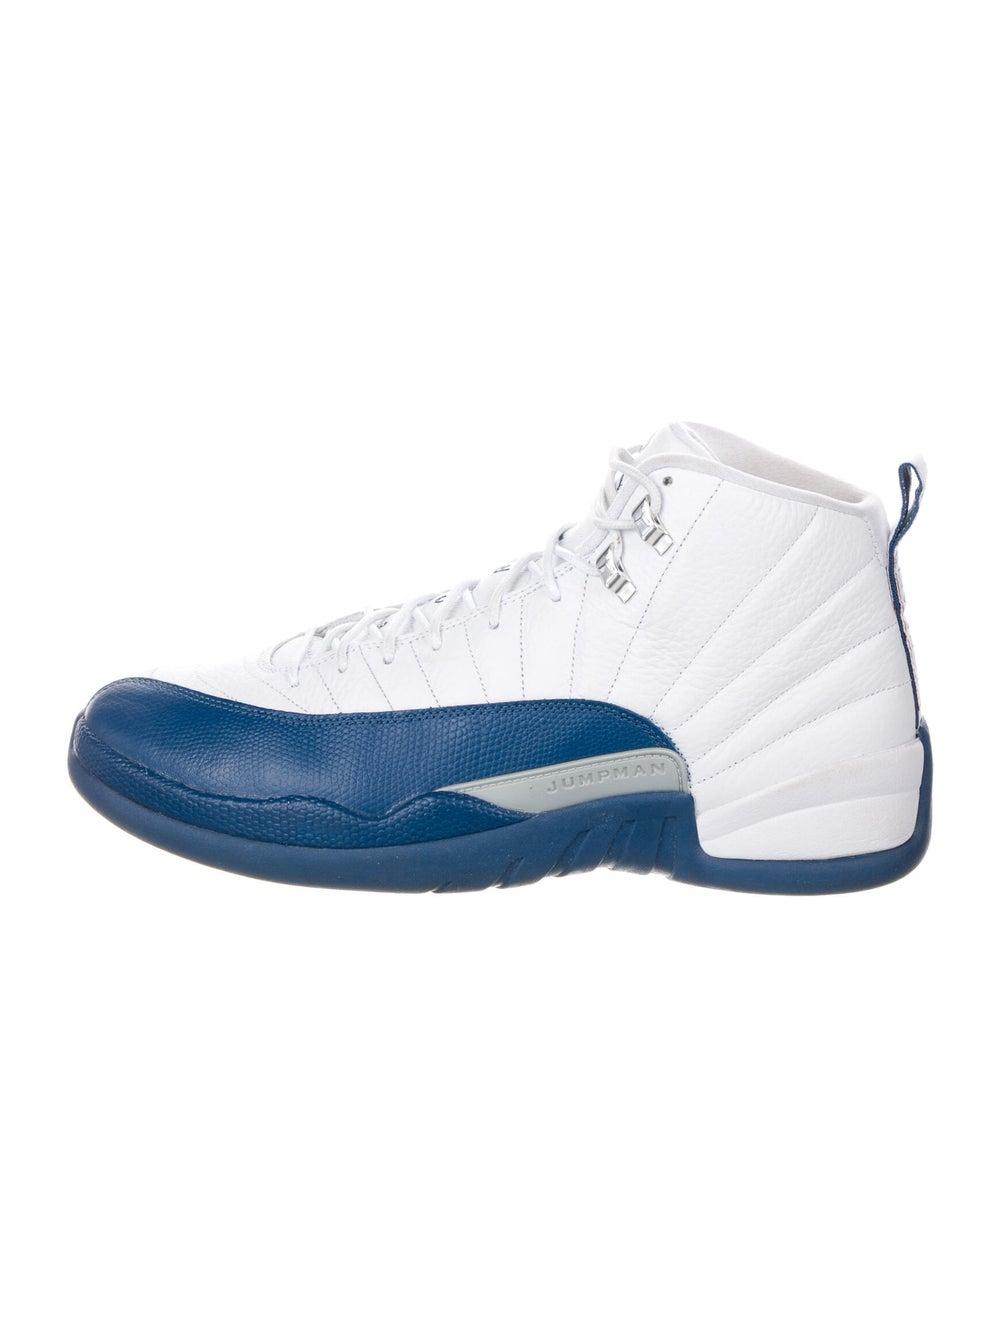 Jordan Jordan 12 Retro French Blue Sneakers Blue - image 1